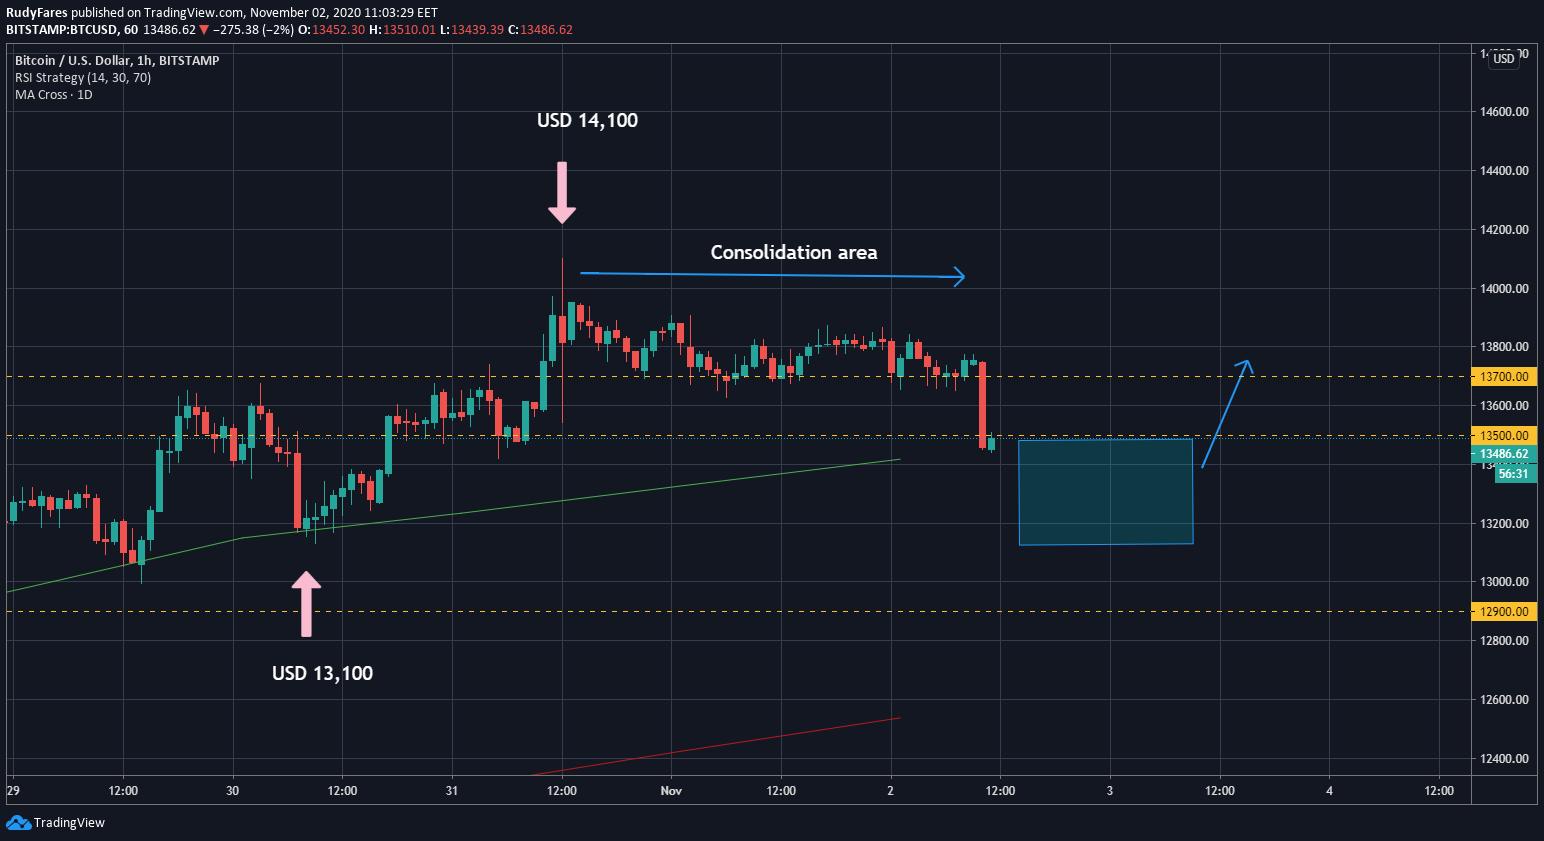 BTC/USD price 1H chart forecast